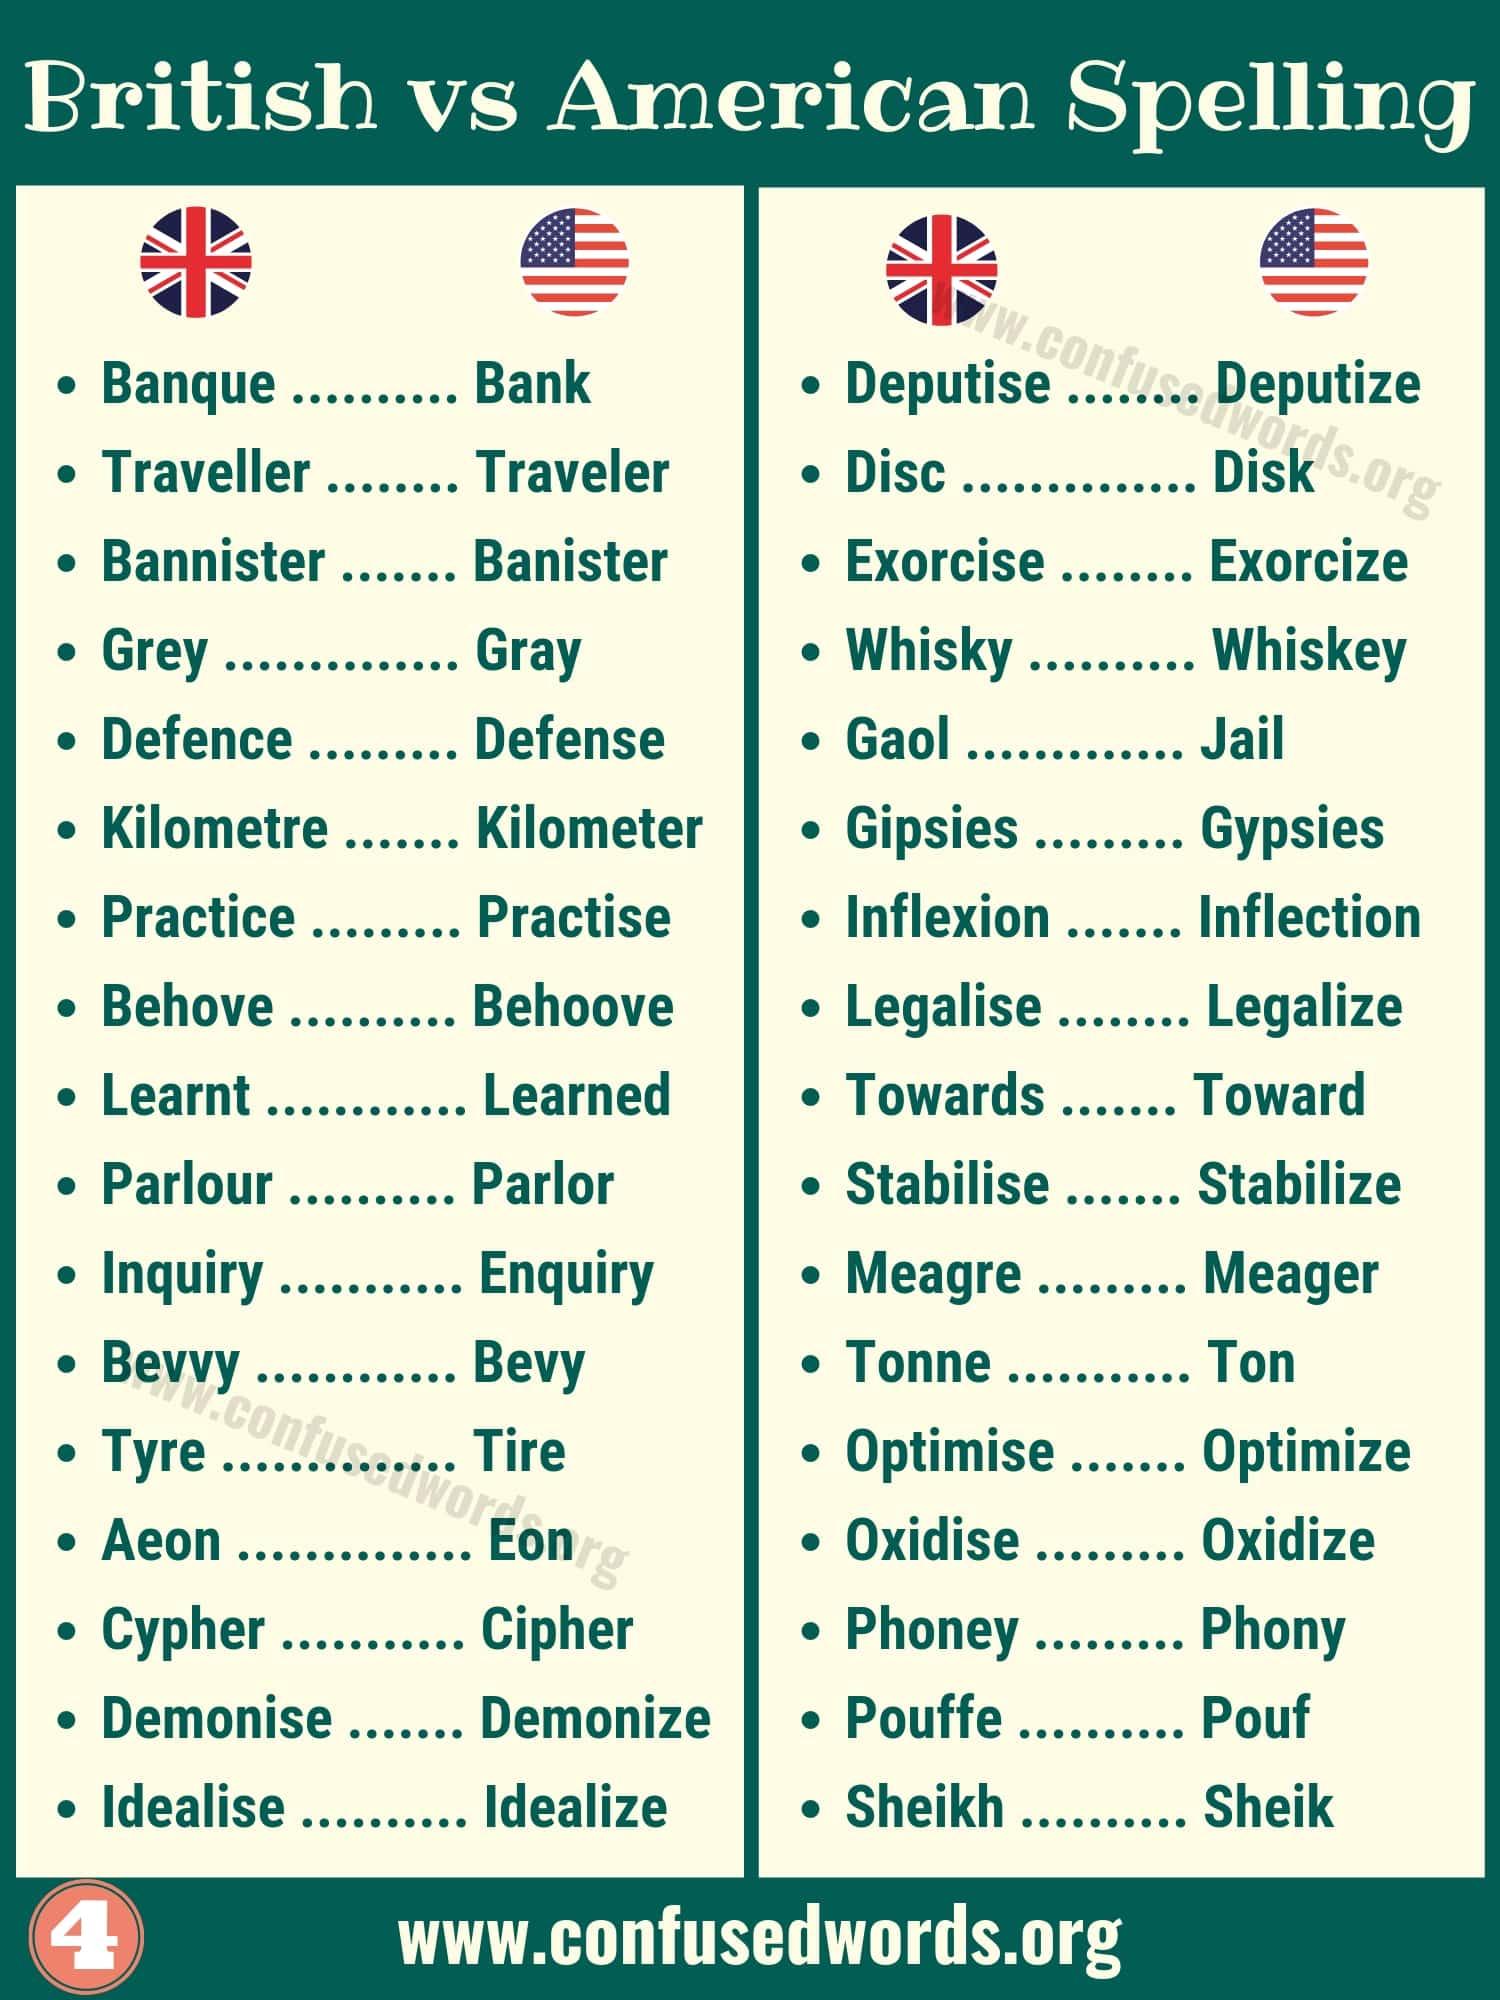 British vs American Spelling